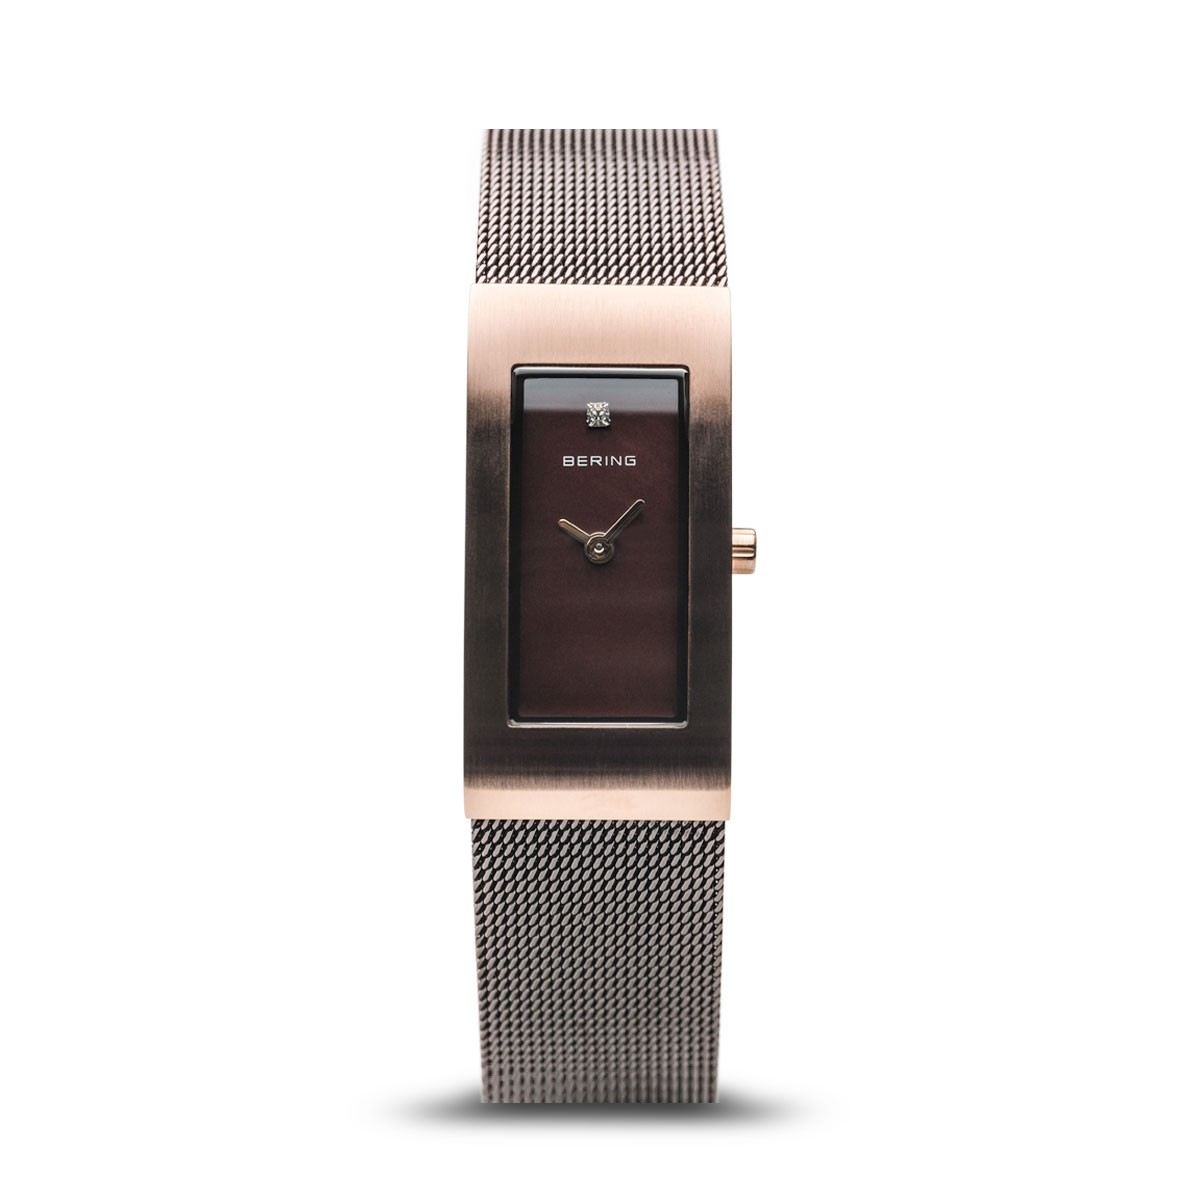 Bering Classic barna női óra rozé tokkal - 10817-262 9a2b0fcc84